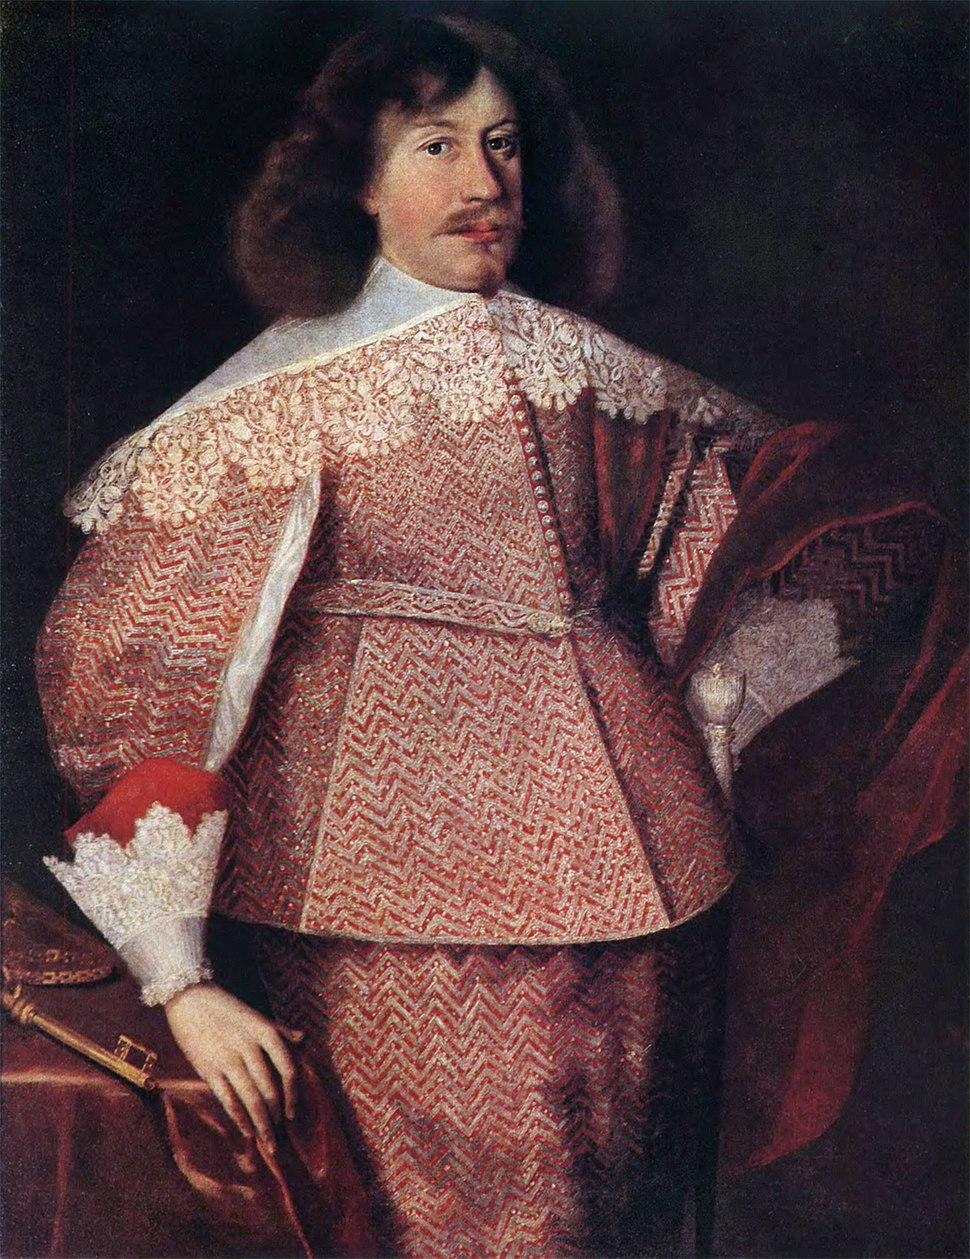 Januš Radzivił. Януш Радзівіл (B. Strobel, 1634)